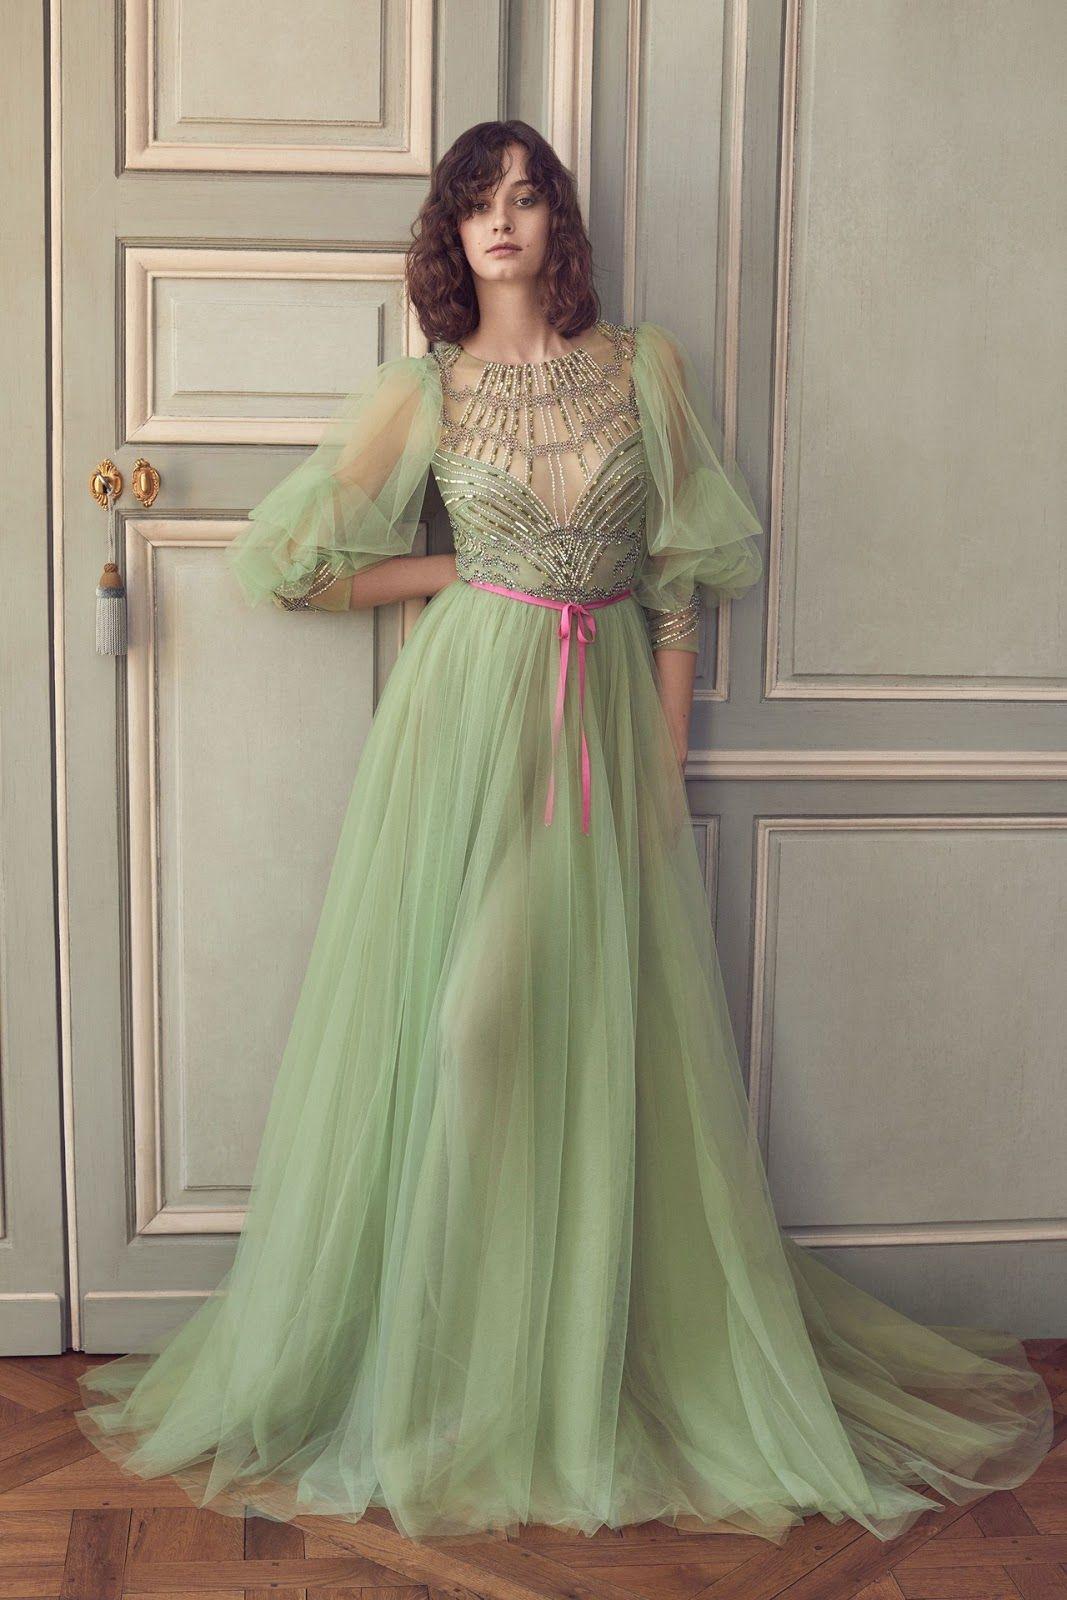 Feminine and elegant gowns monique lhuillier july